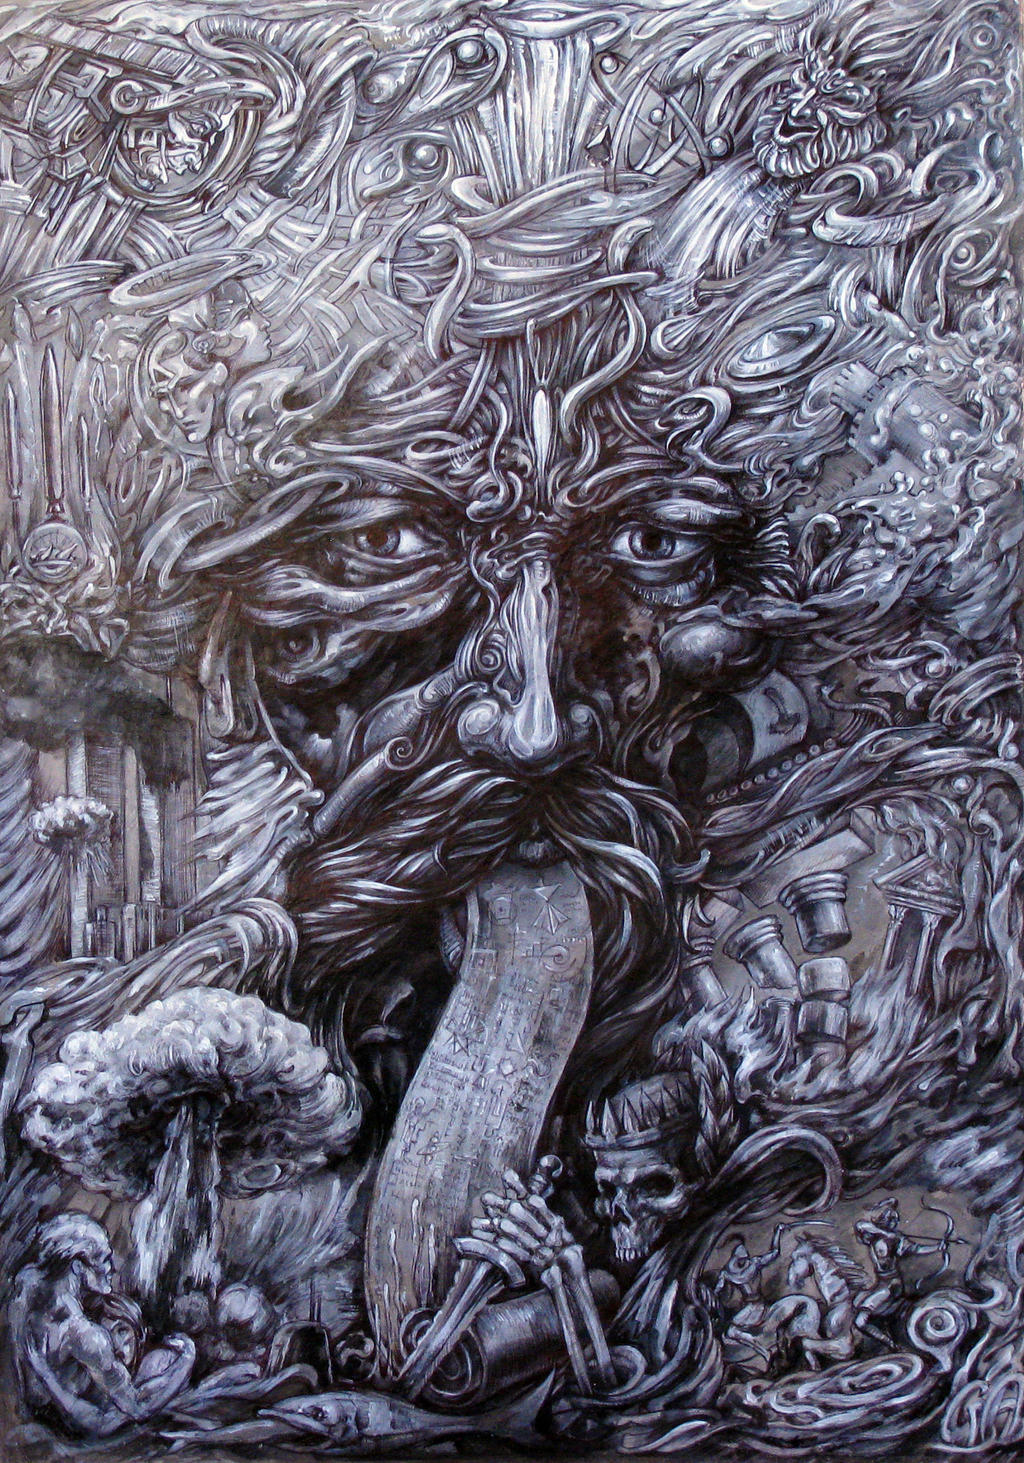 Prophecy by Somaritan